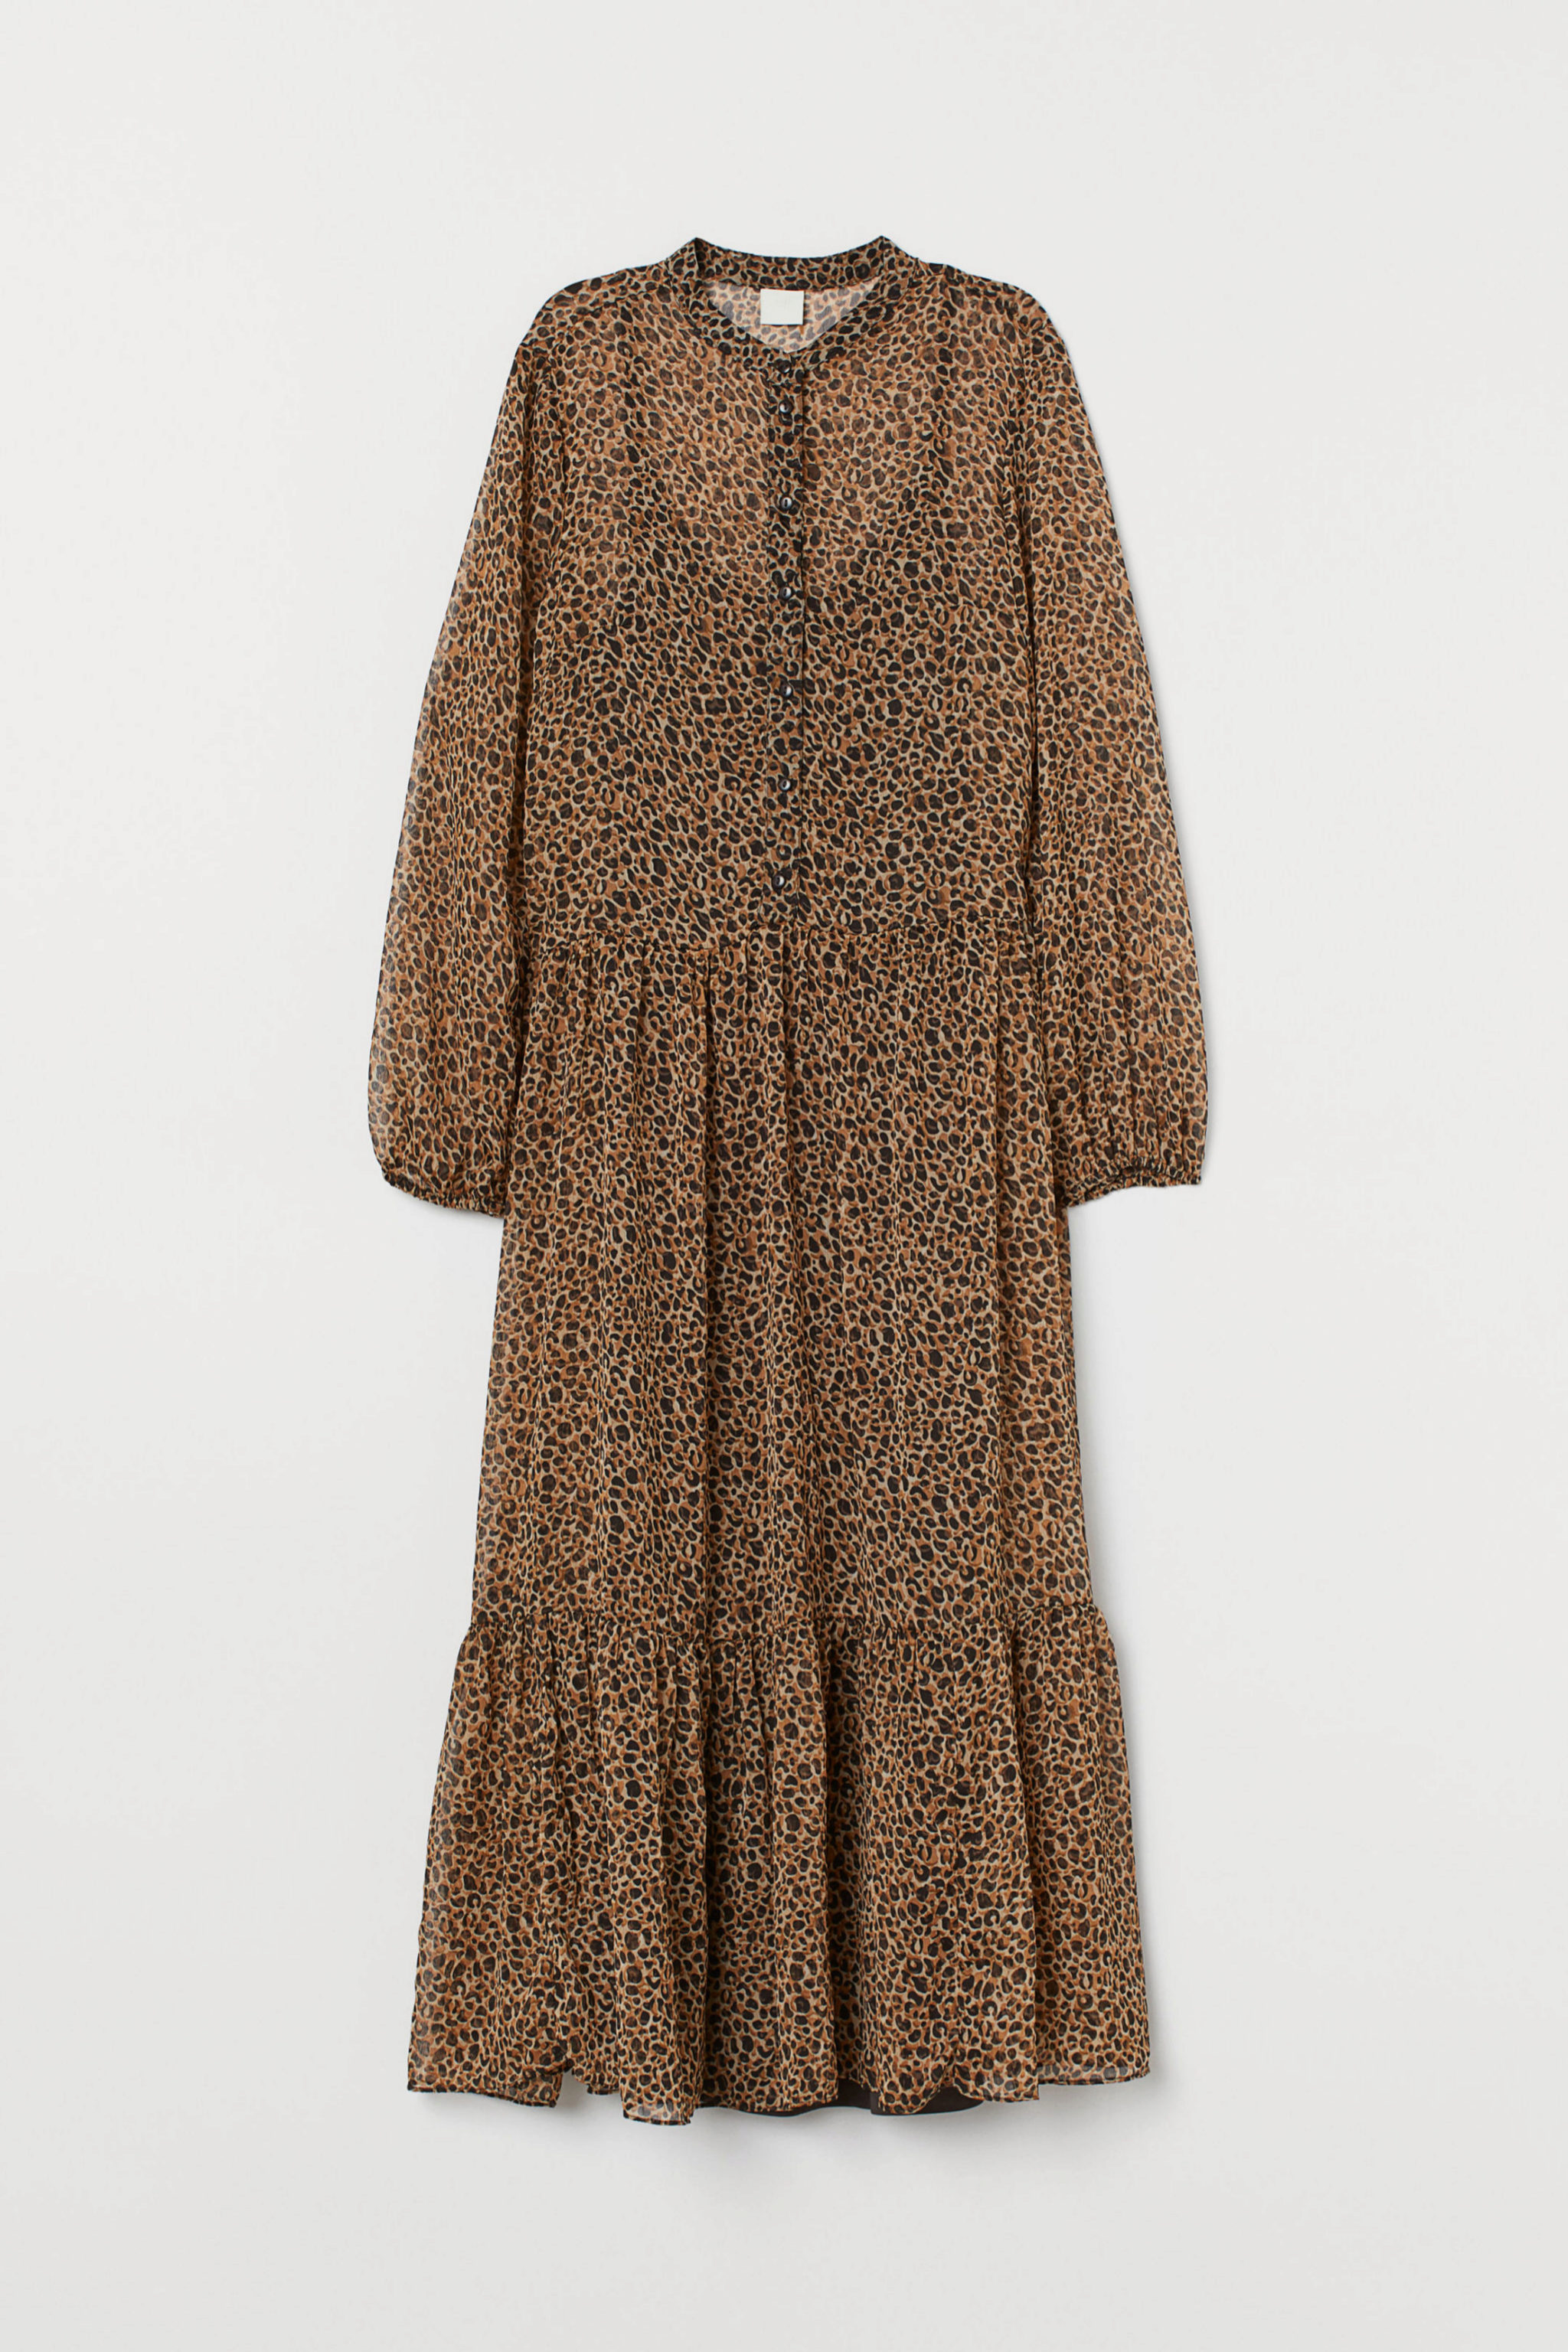 Vestido de gasa de 'animal print' de H&M